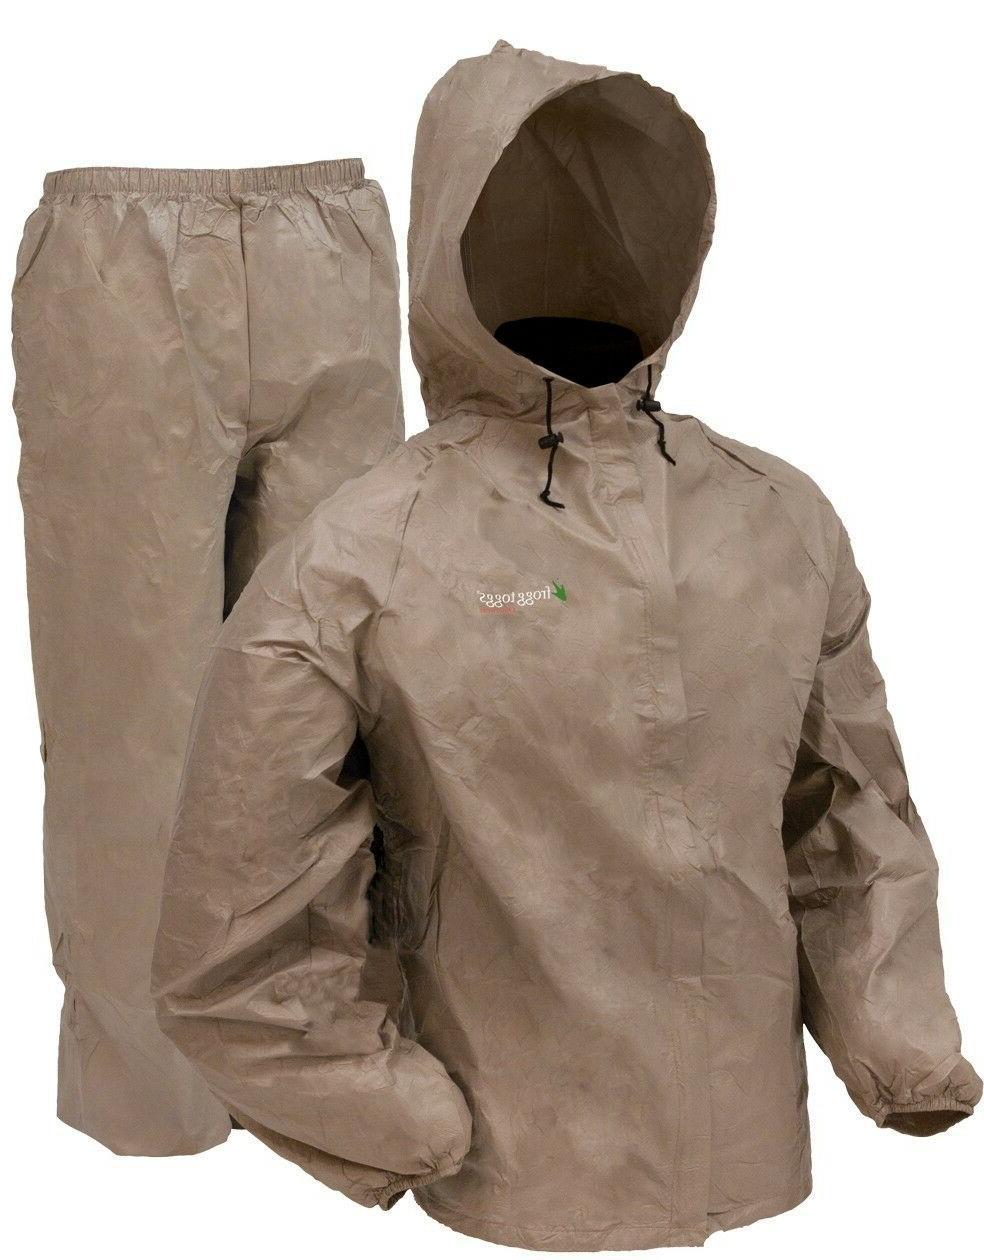 Frogg UL12104 Ultra Lite Rain New CHOOSE COLOR & FREE STUFF SACK